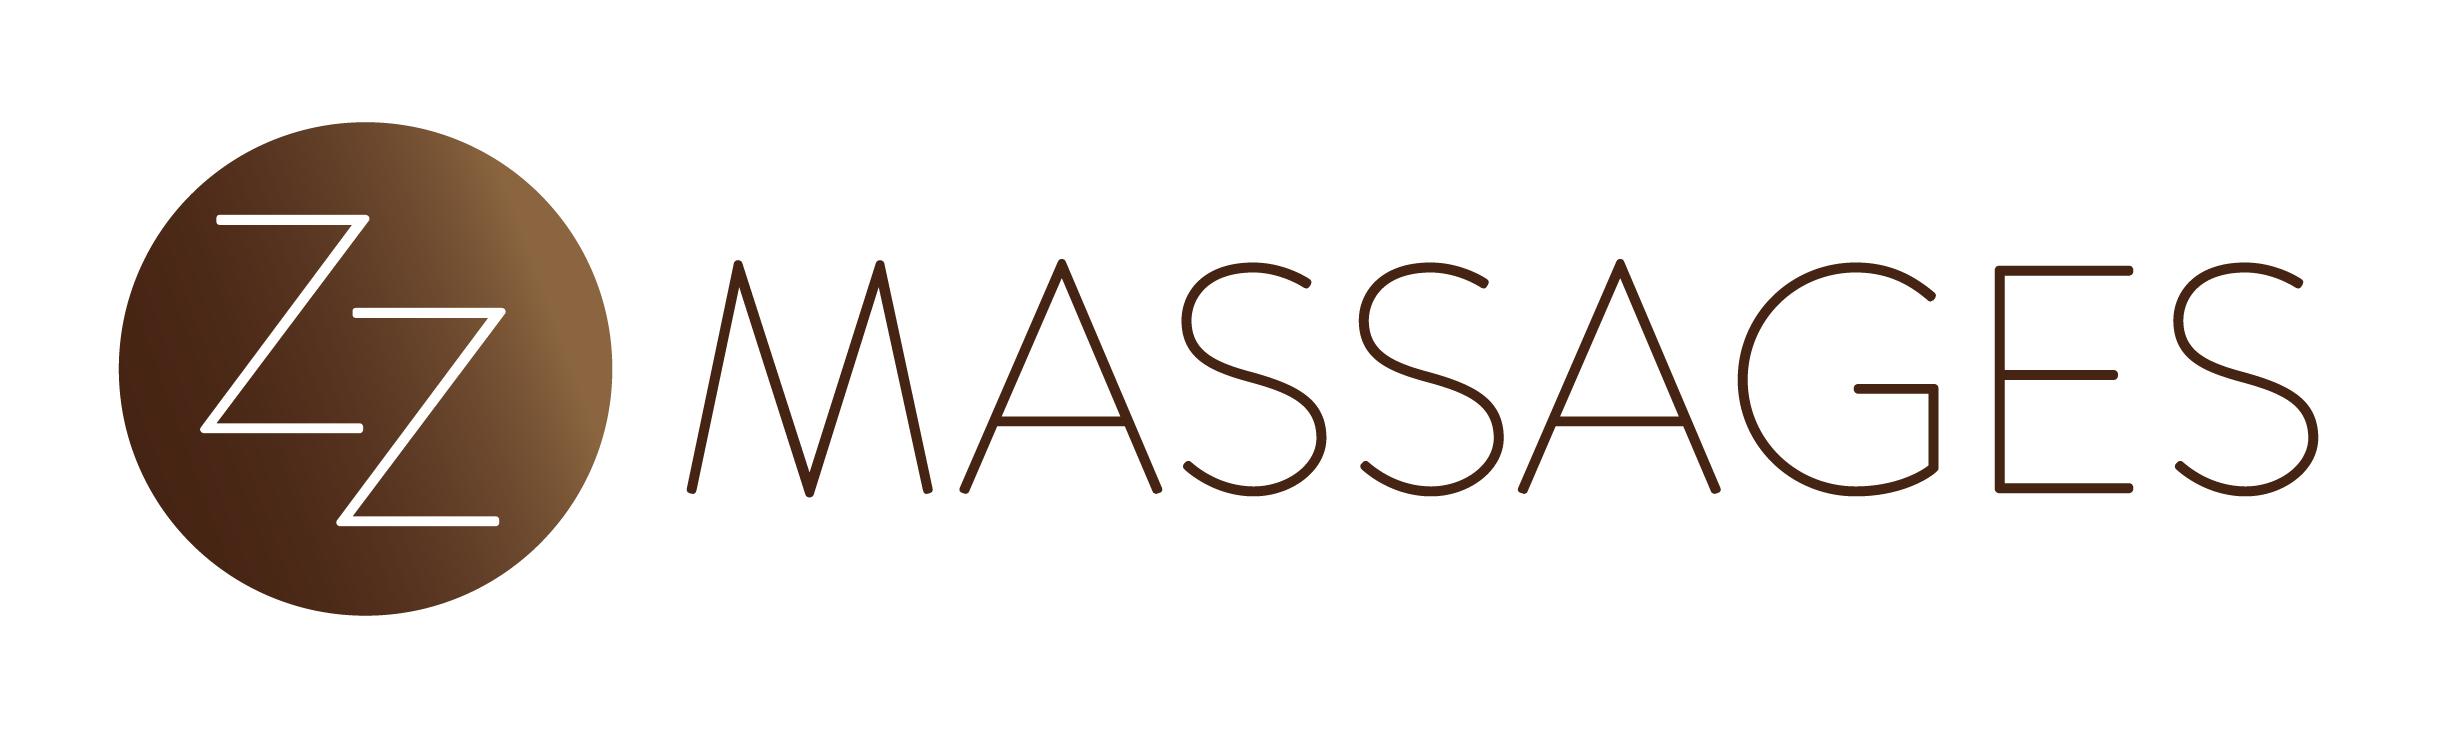 zzmass-logo-brown-01.png